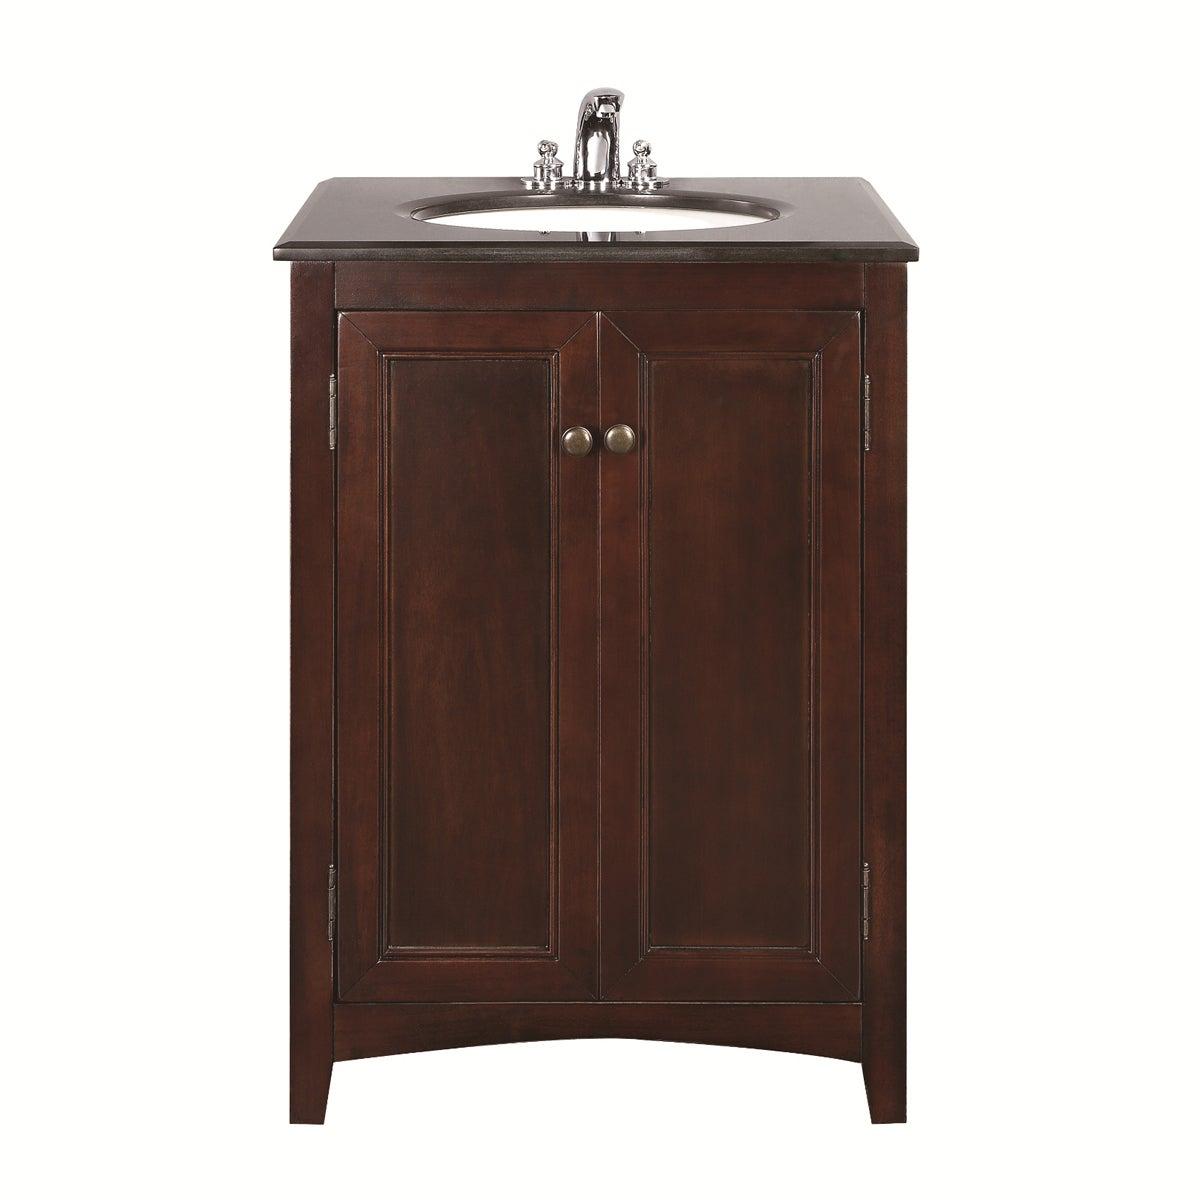 Wyndenhall Windsor Walnut Brown 24 Inch Bath Vanity With 2 Doors And Black Granite Top Free